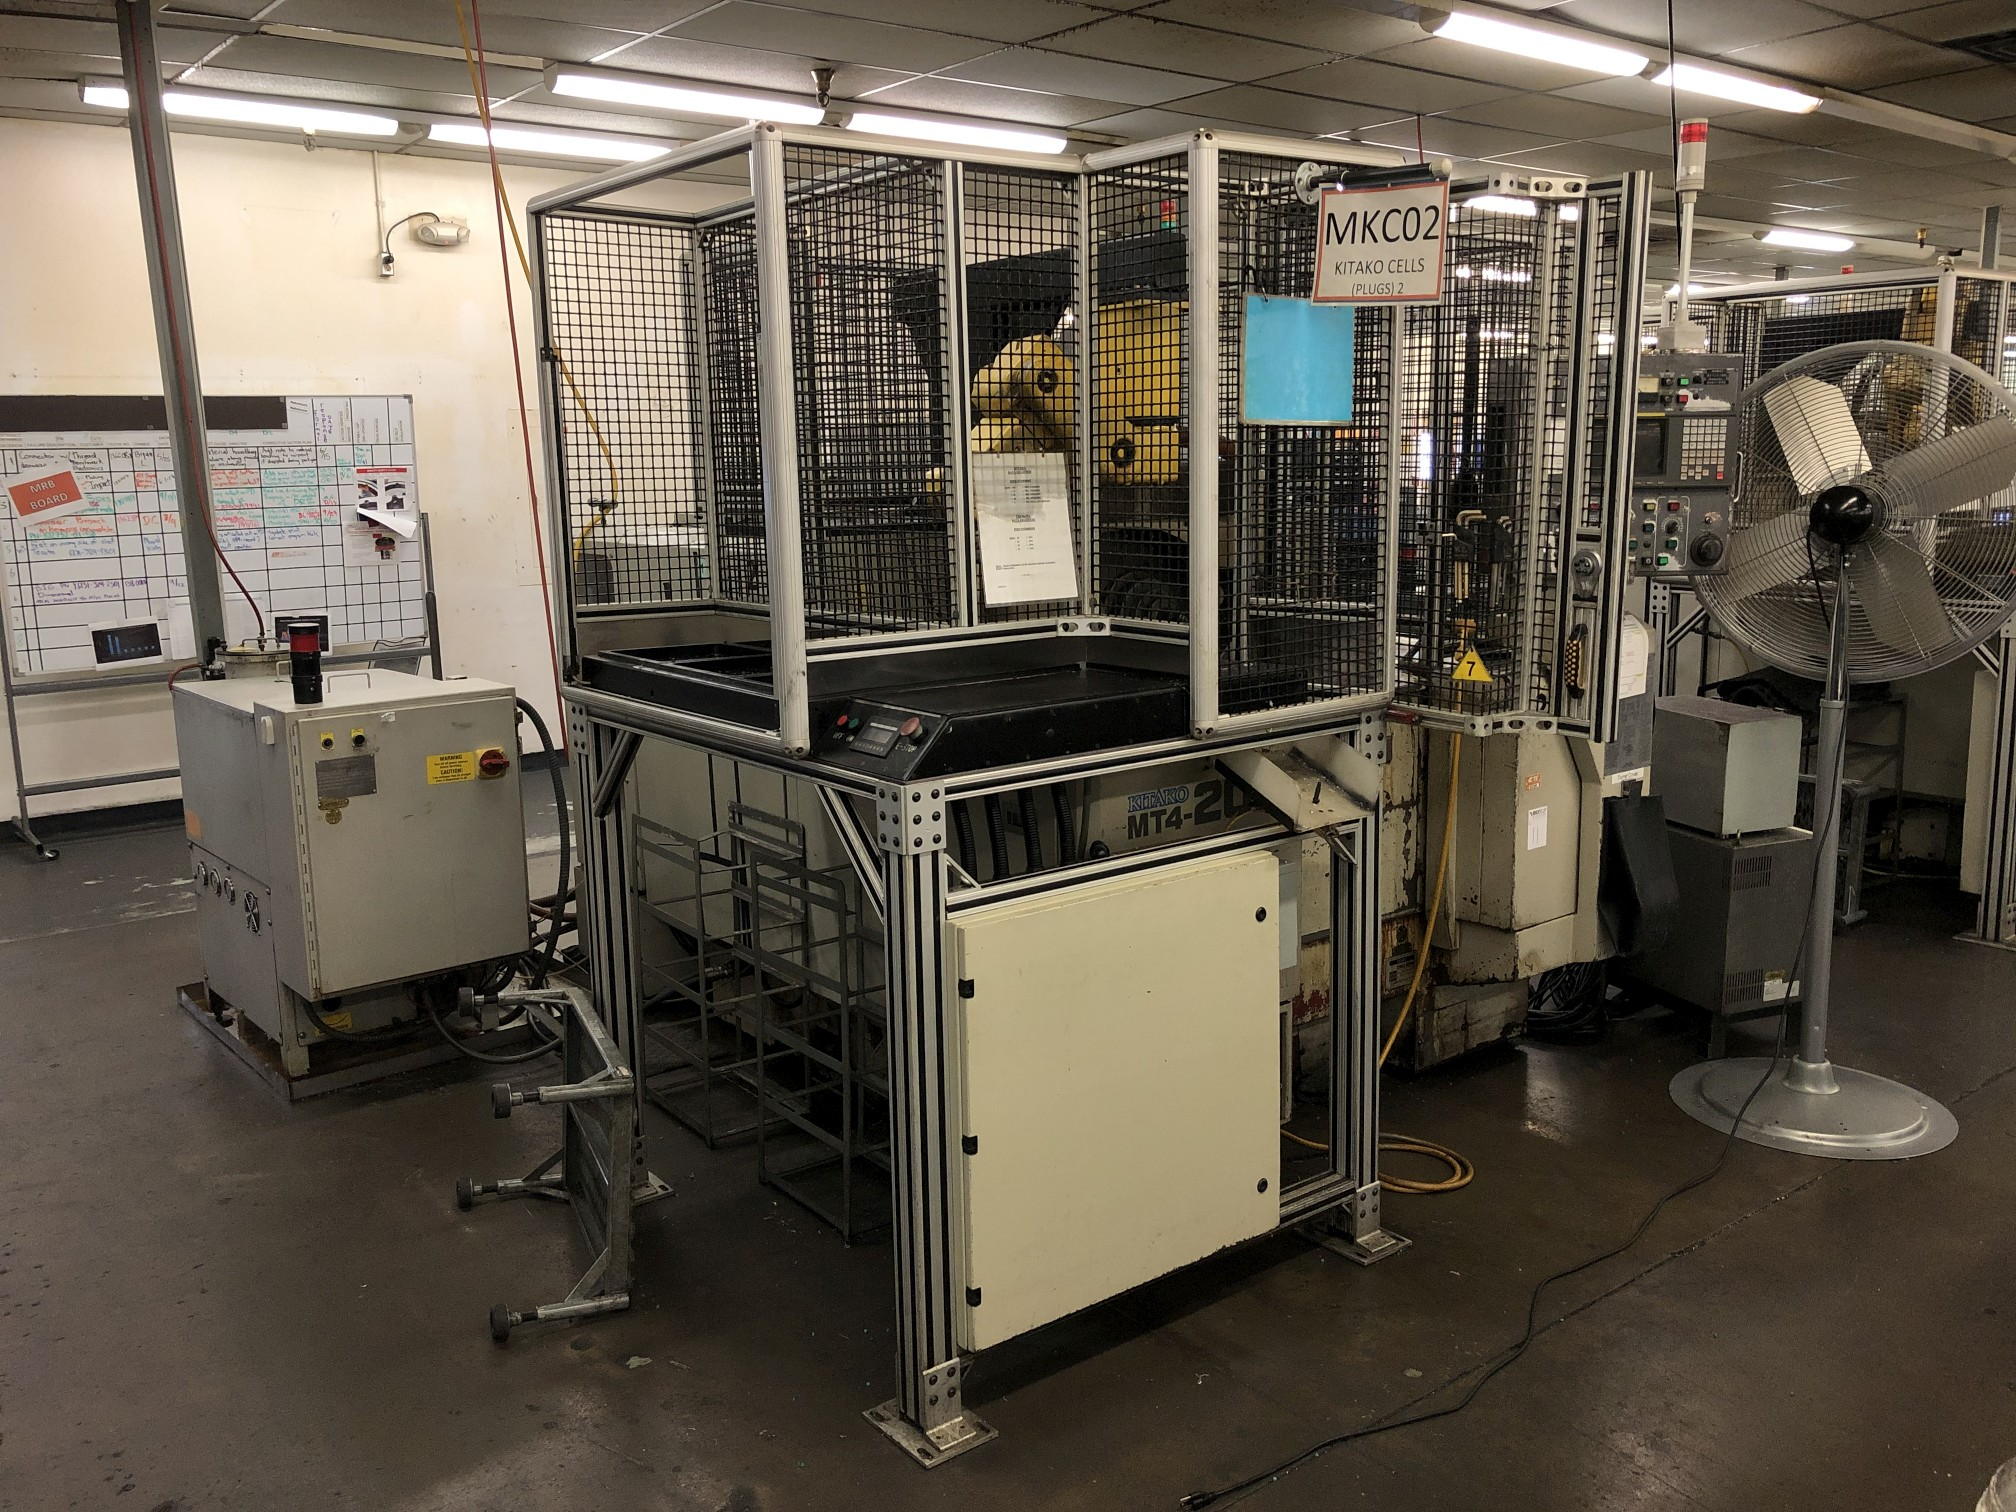 1999 Kitako MT4-200 Multi-Spindle CNC Turning Mill - Image 16 of 17